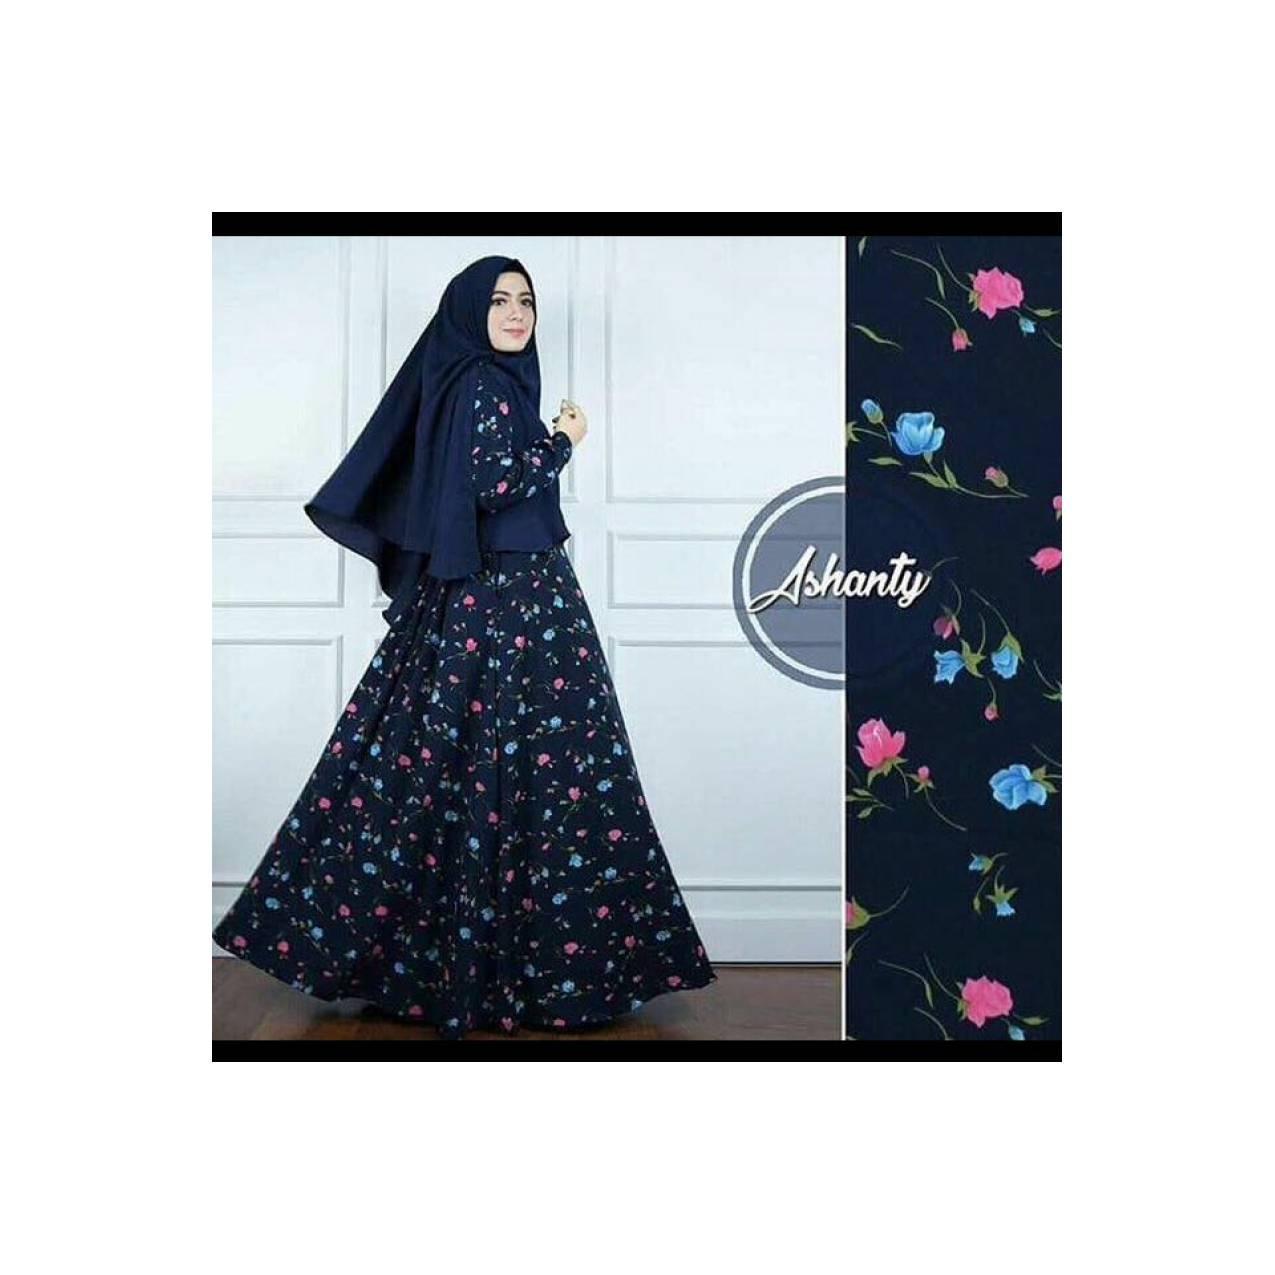 set gamis wolpich navy gamis motif bunga kecil dress muslim ori cant T